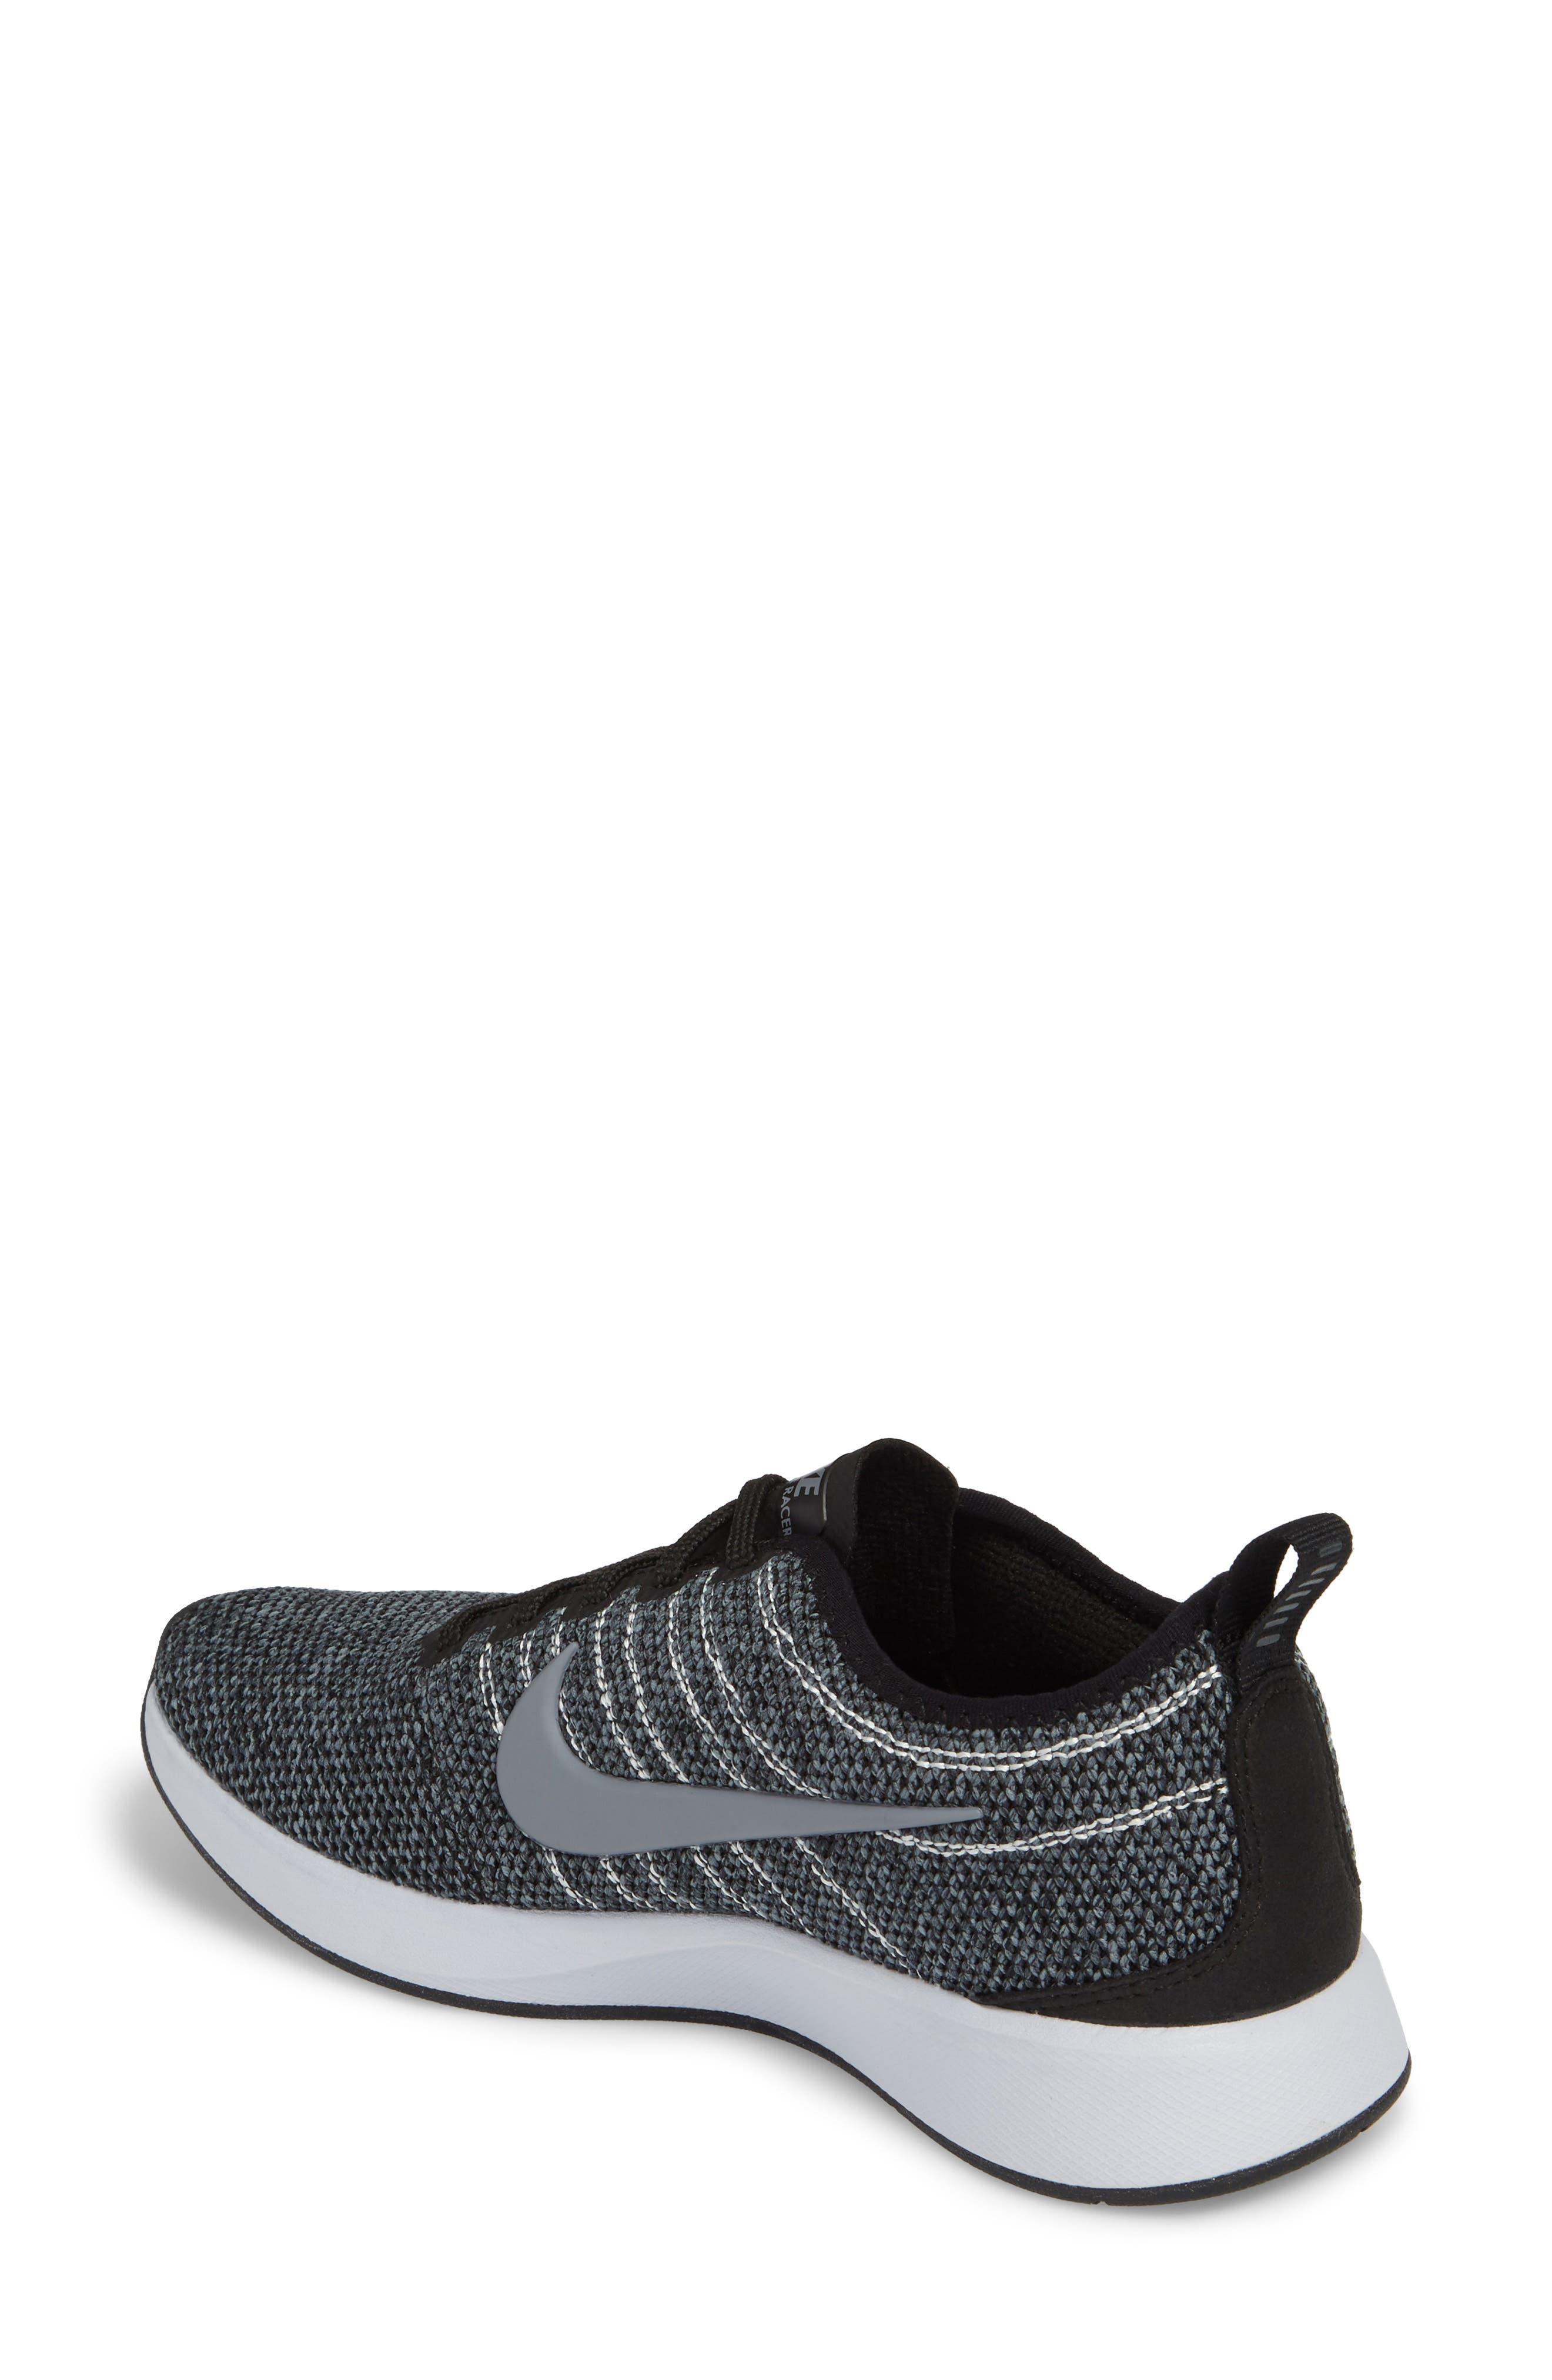 Dualtone Racer PRM Sneaker,                             Alternate thumbnail 5, color,